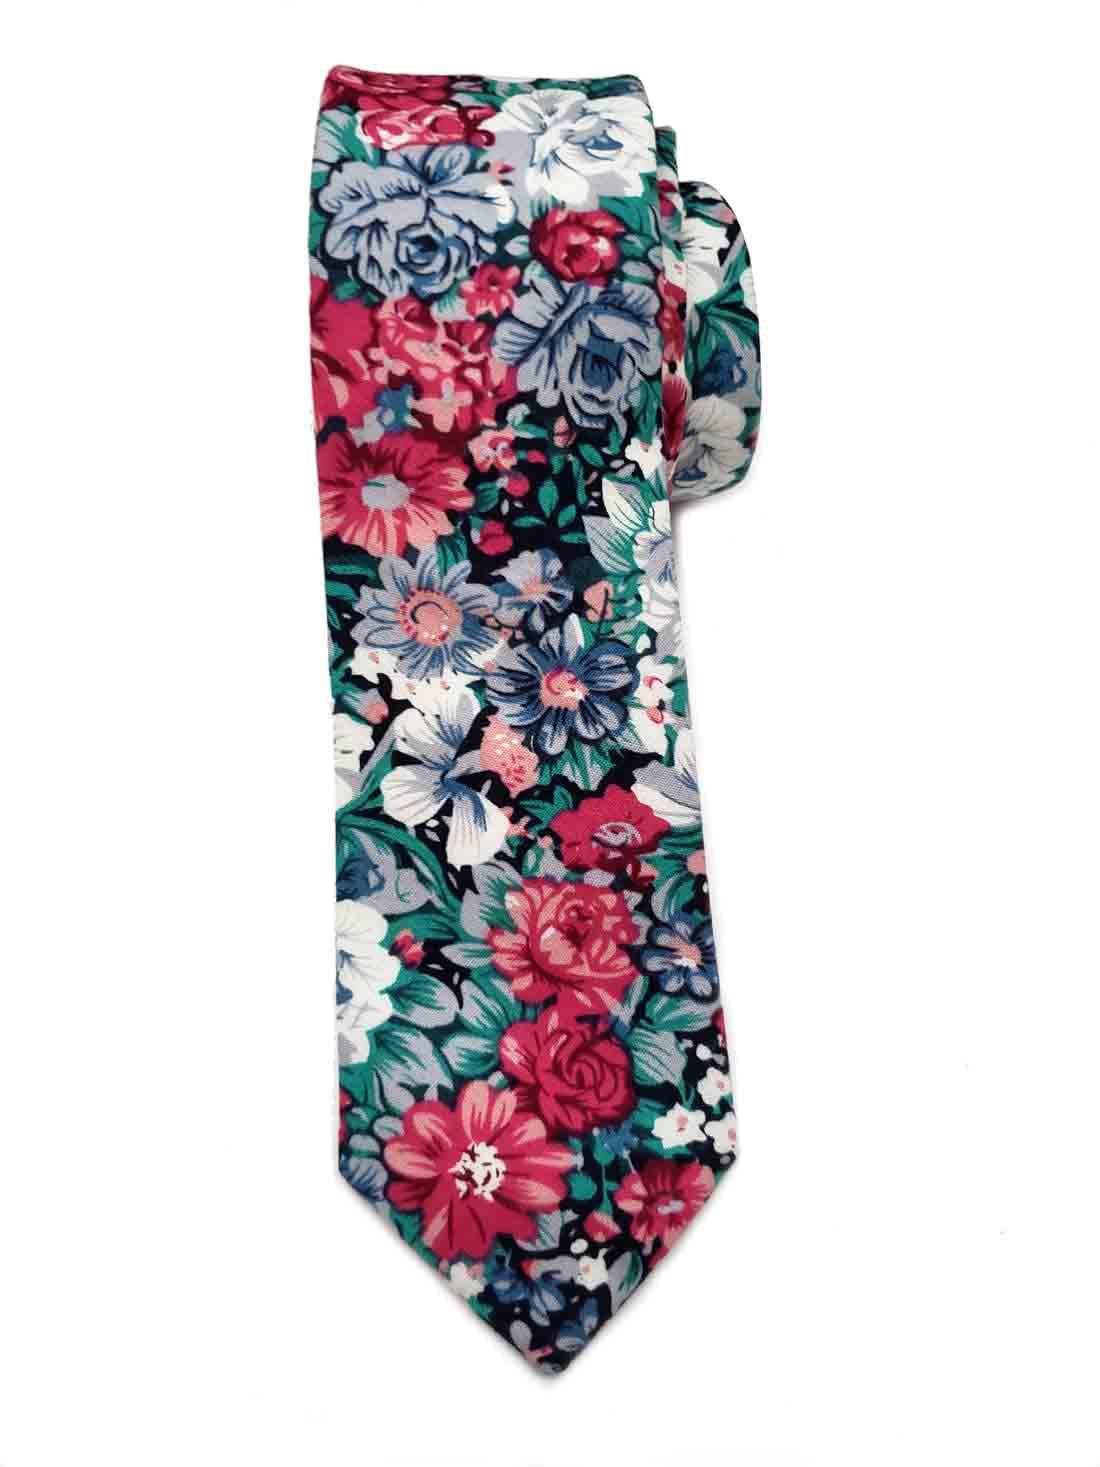 Gascoigne Floral Cotton Tie Red Pink Green White Men's Narrow